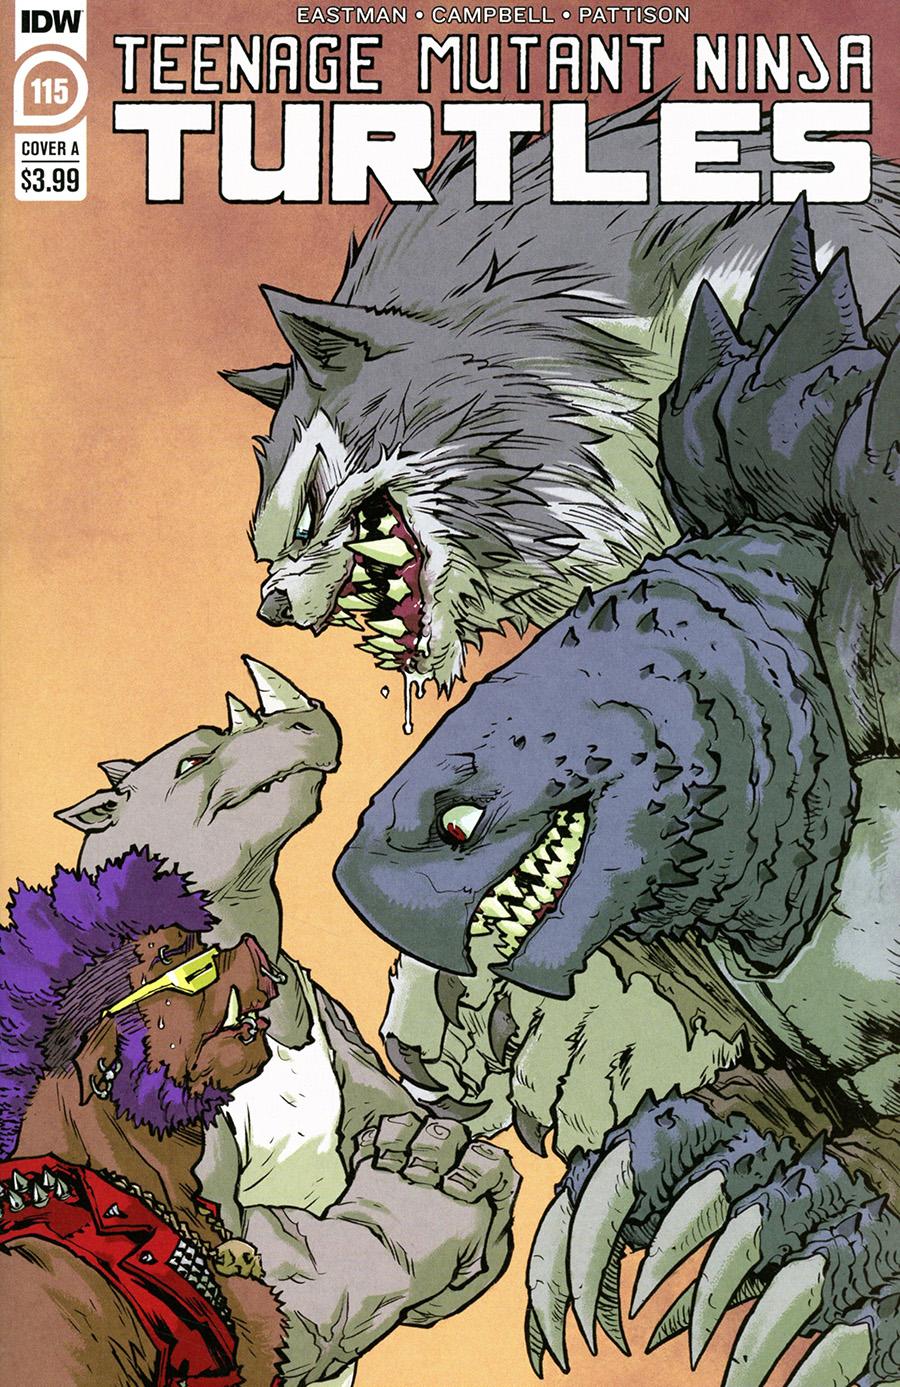 Teenage Mutant Ninja Turtles Vol 5 #115 Cover A Regular Sophie Campbell Cover